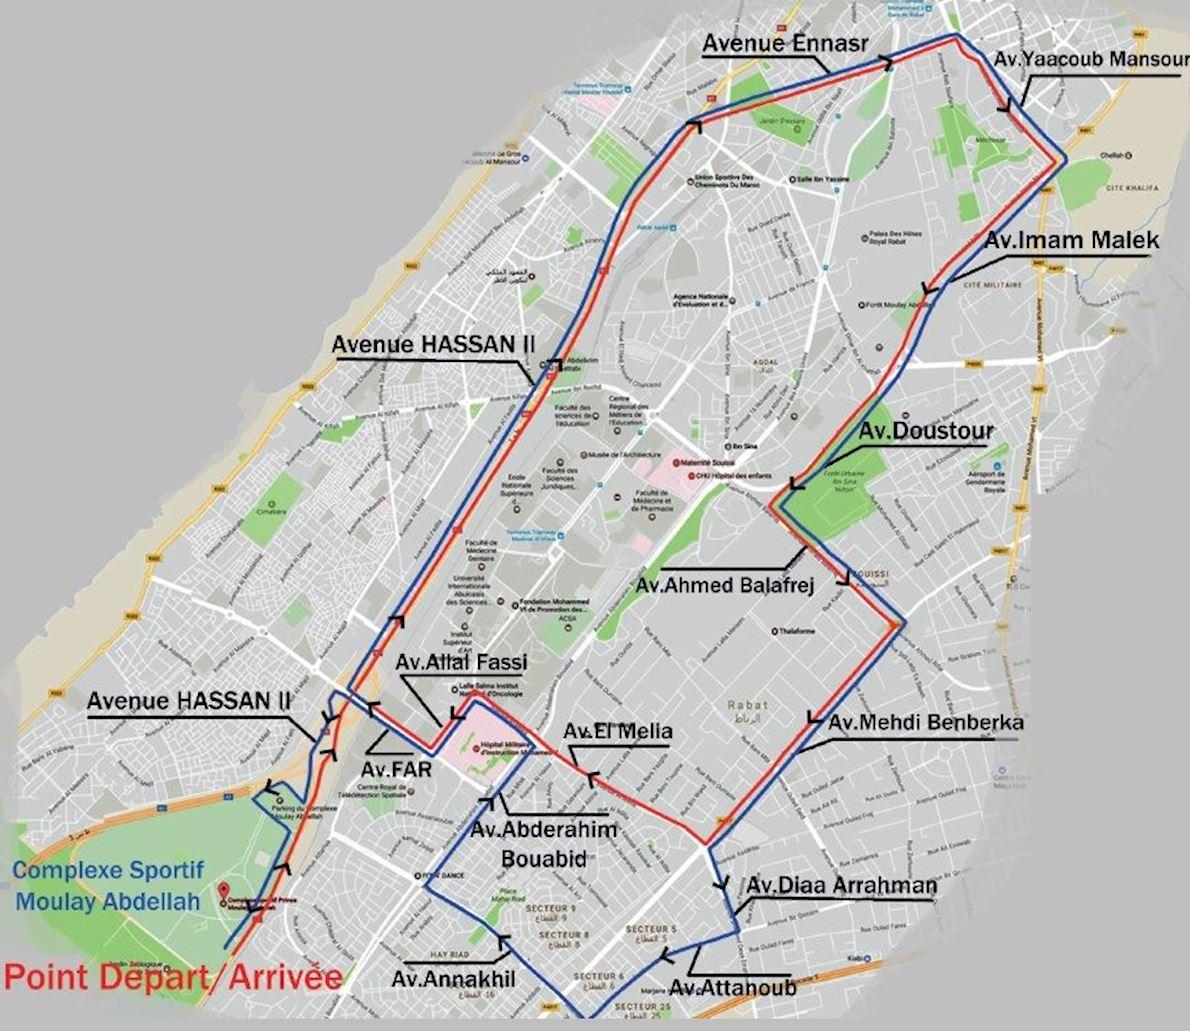 Marathon International de Rabat Route Map